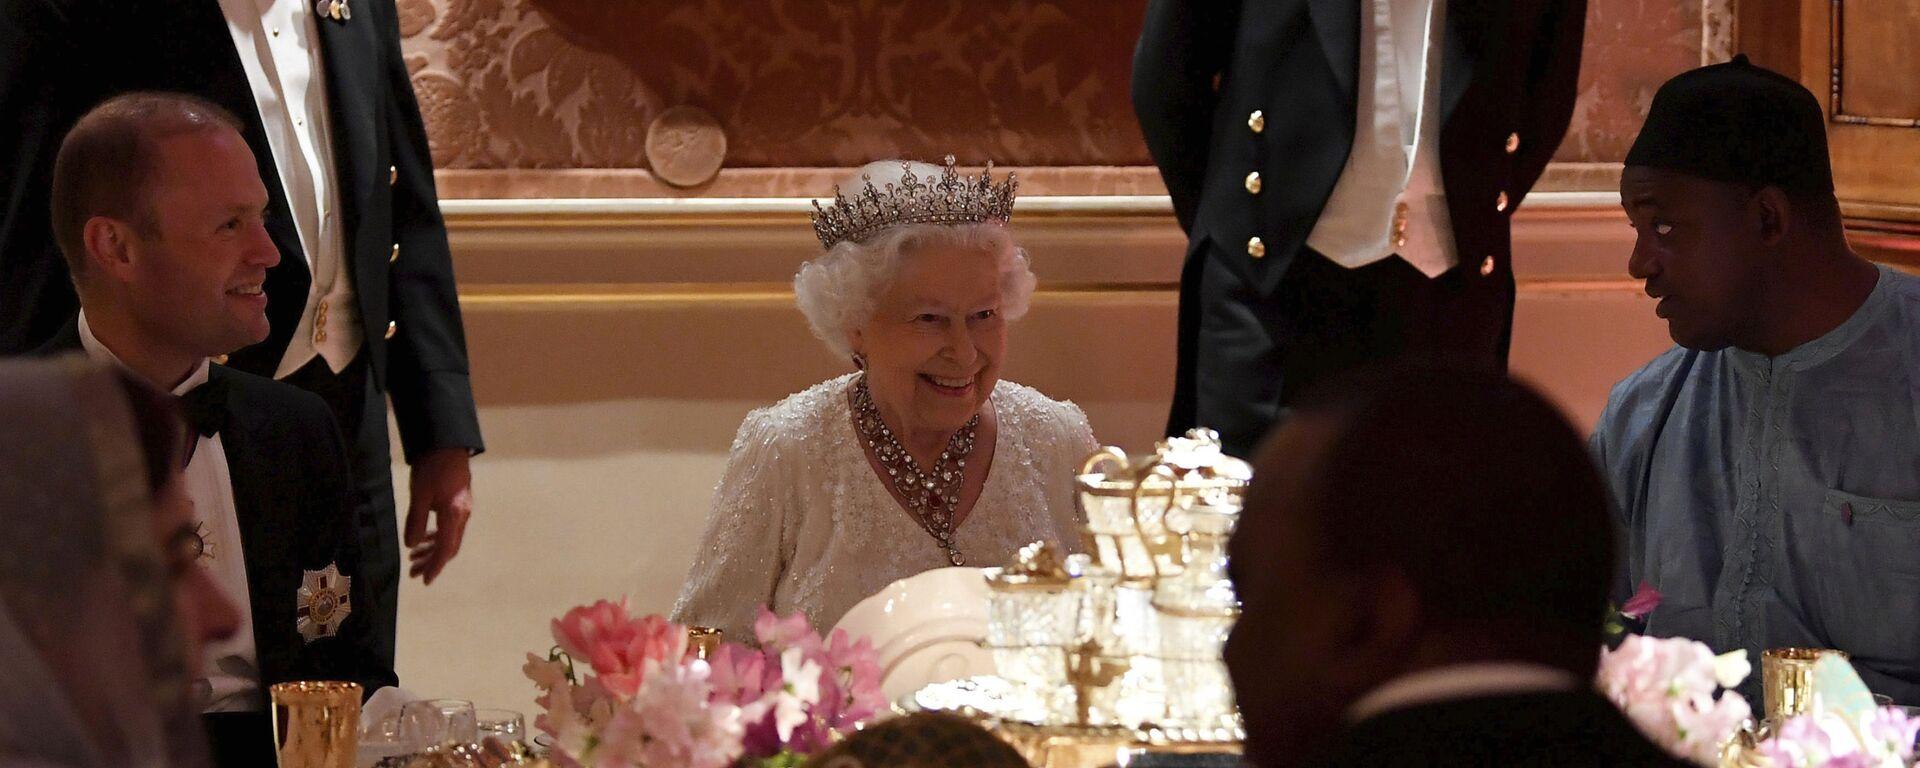 Королева Великобритании Елизавета II во время обеда в Букингемском дворце - Sputnik Азербайджан, 1920, 07.09.2021